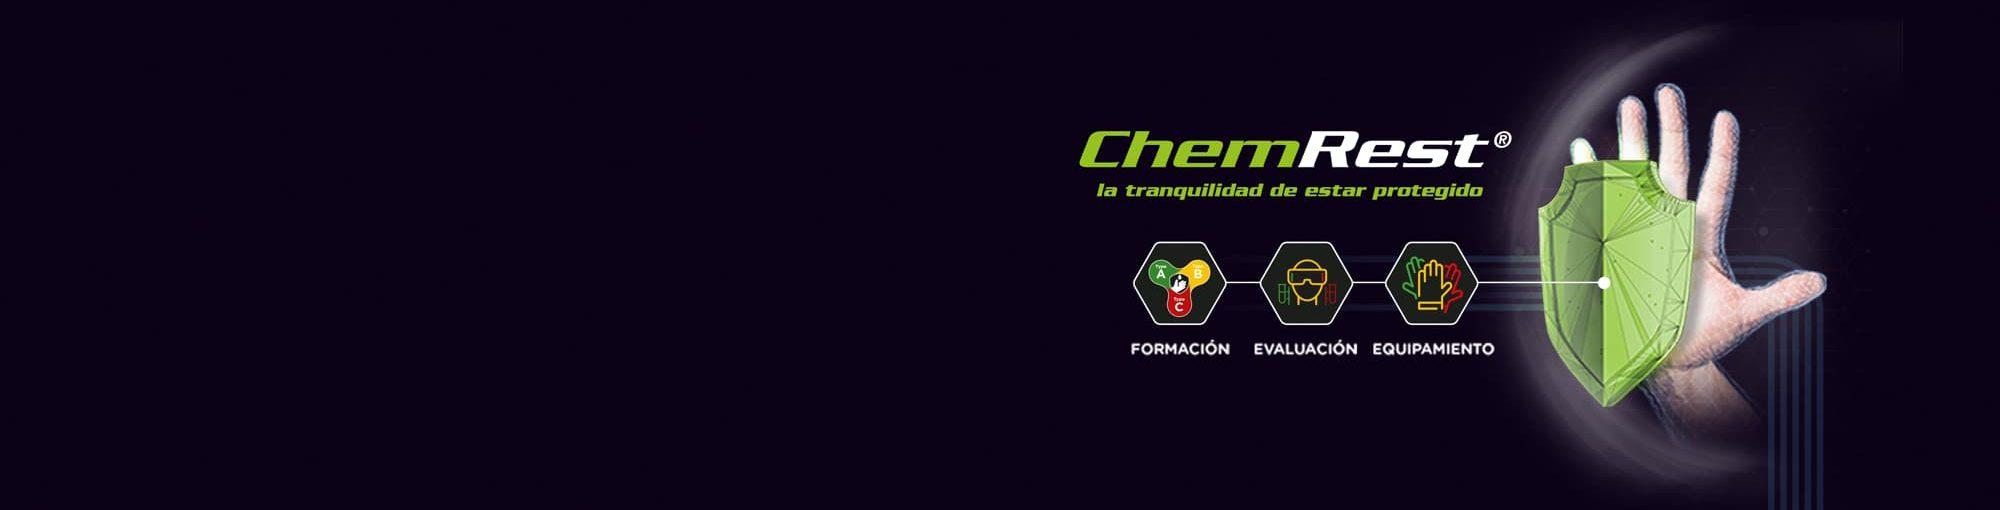 Showa_Chemrest_banner_homepage_v1.0_ES